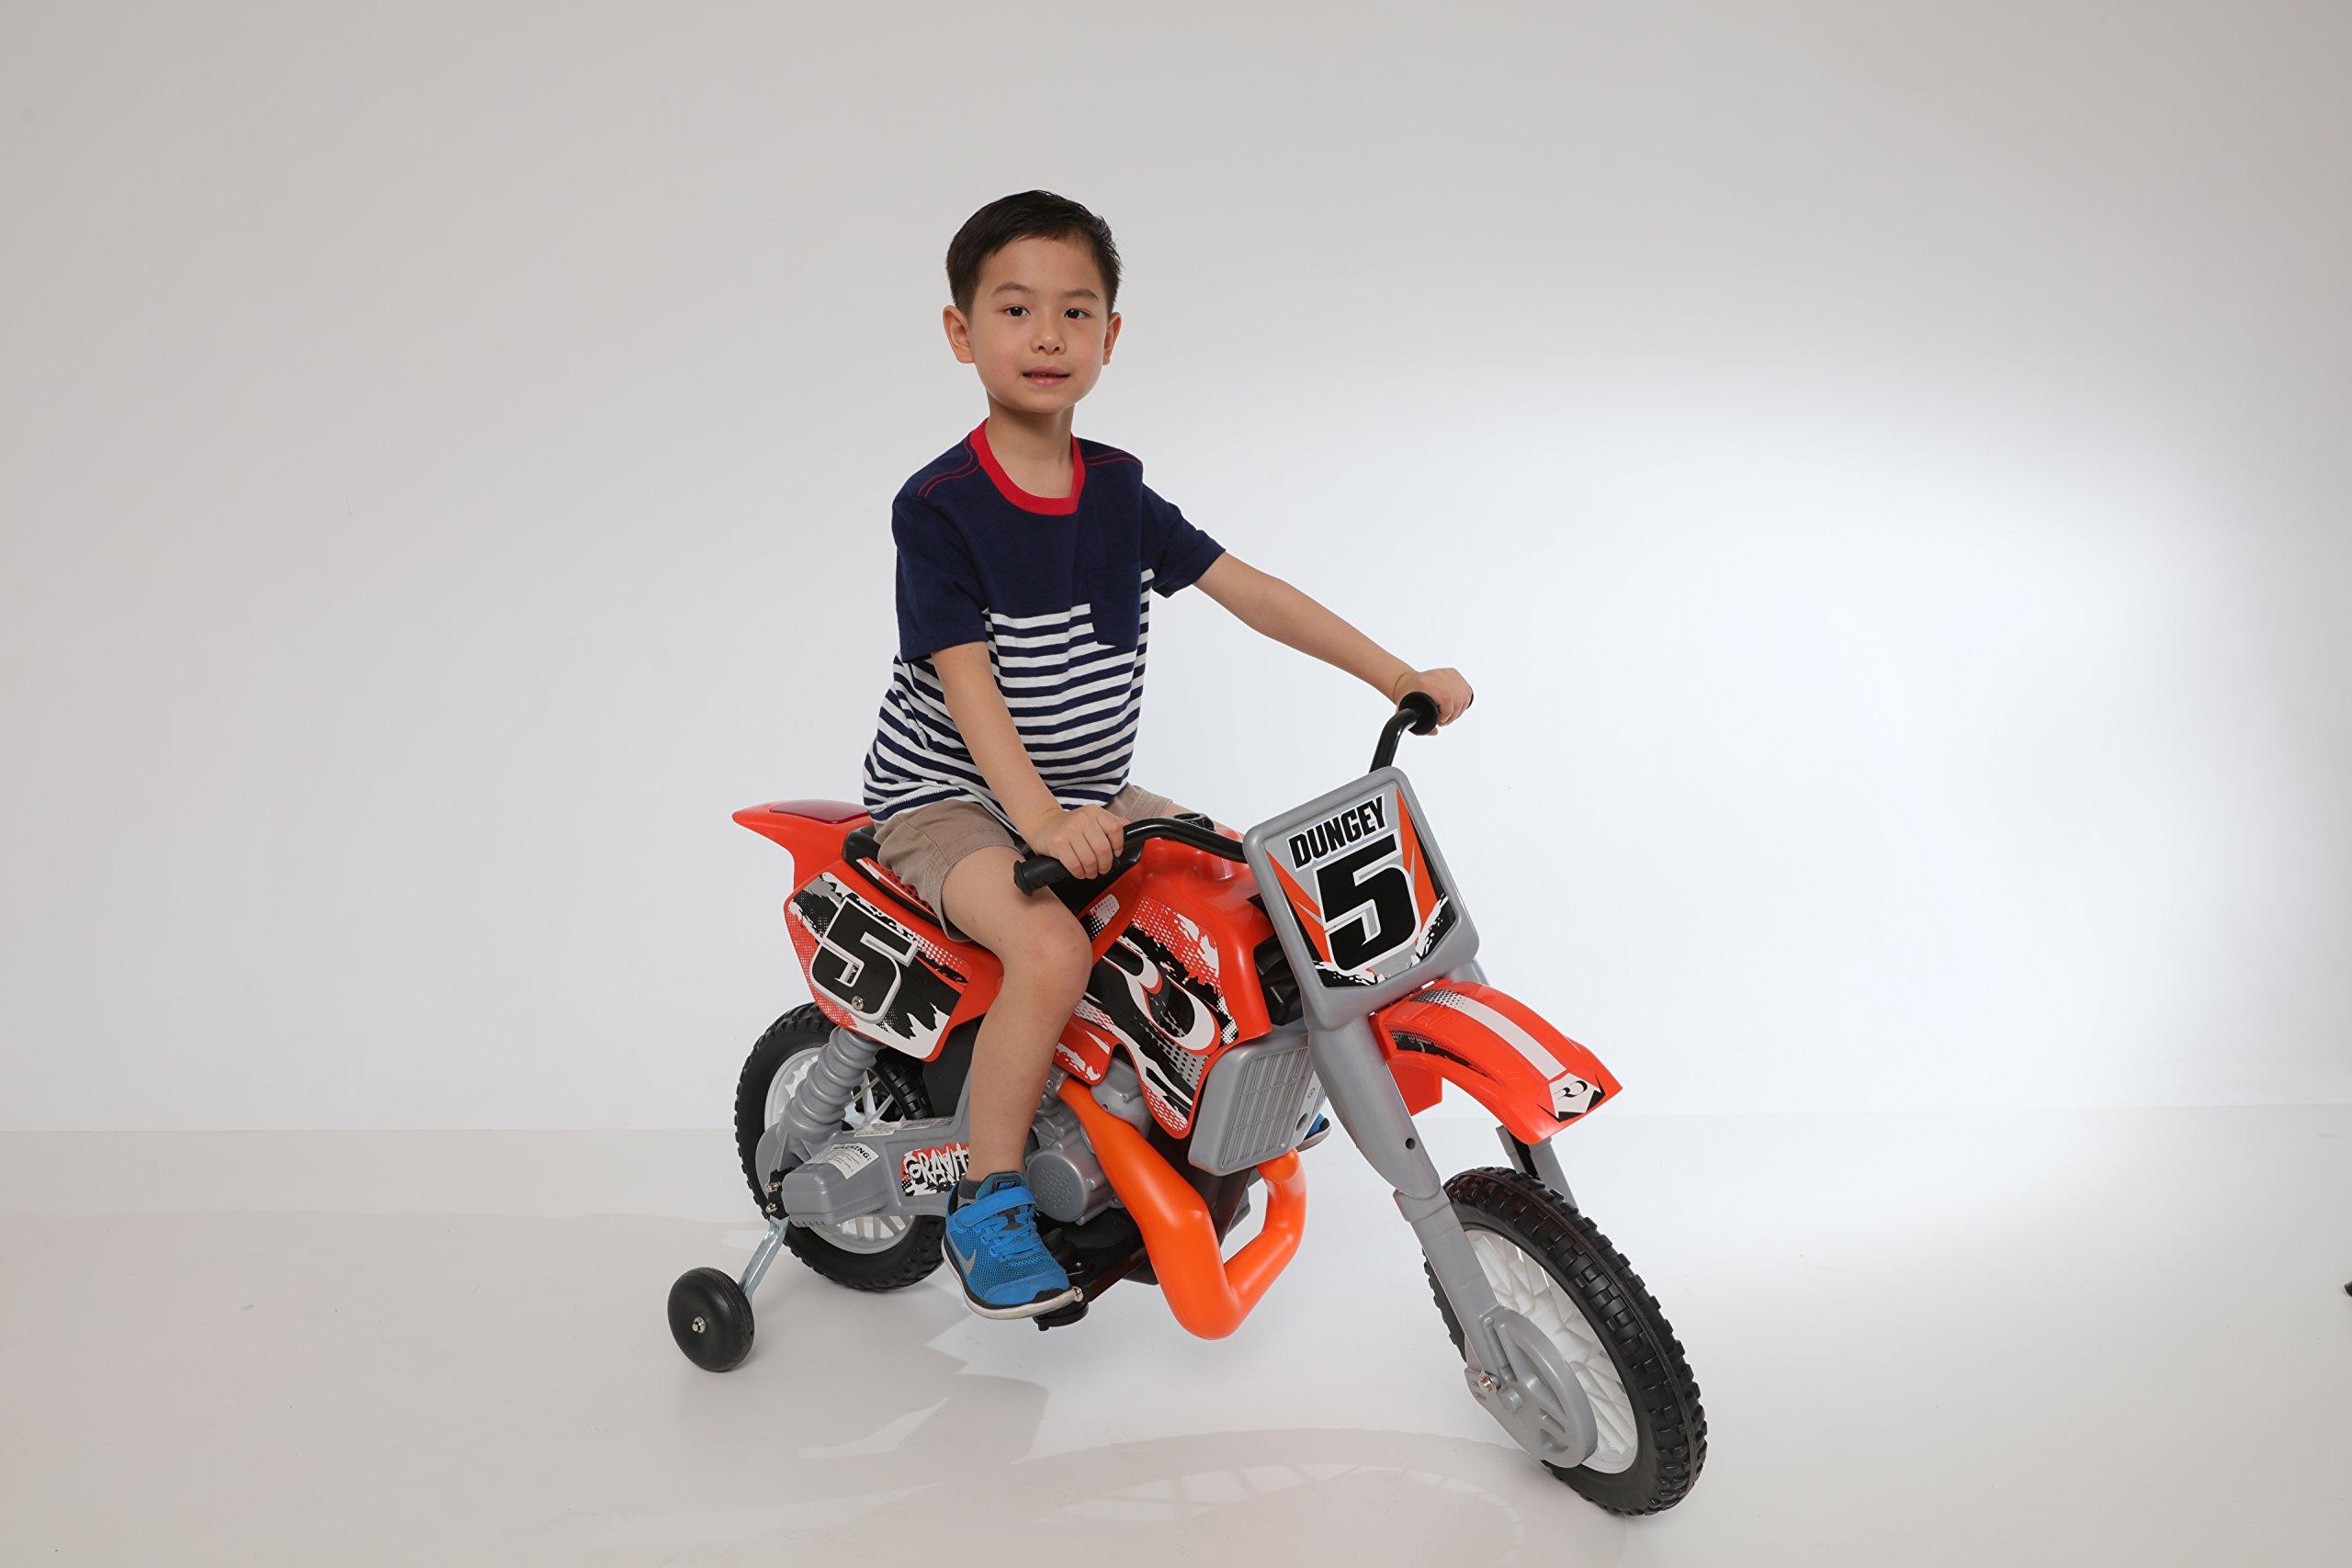 Beyond Infinity Ryan Dungey Battery Powered 12V Motocross Dirt Bike, Orange/Black/White, 47.2'' x 22.1'' x 28.38''